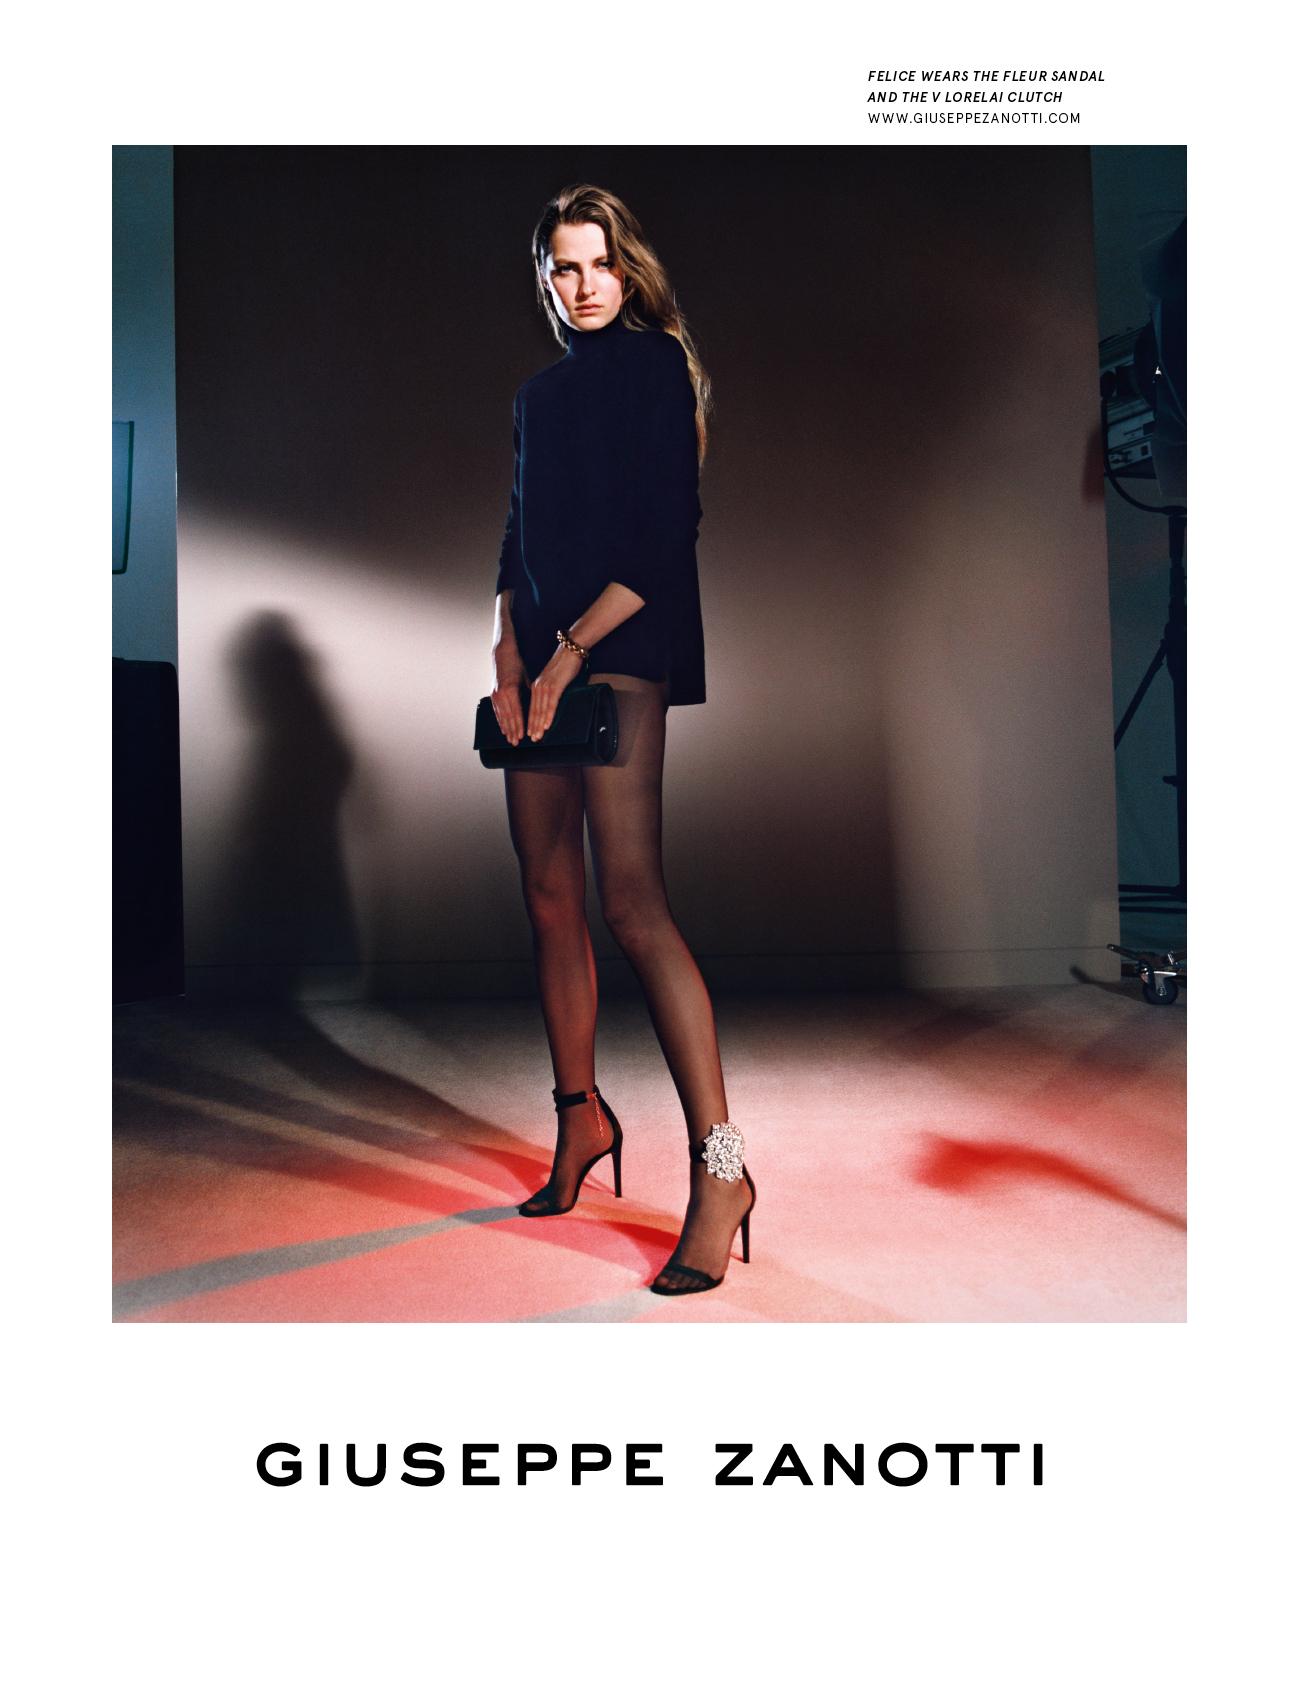 giuseppe_zanotti_fall_2019_campaign4.jpg